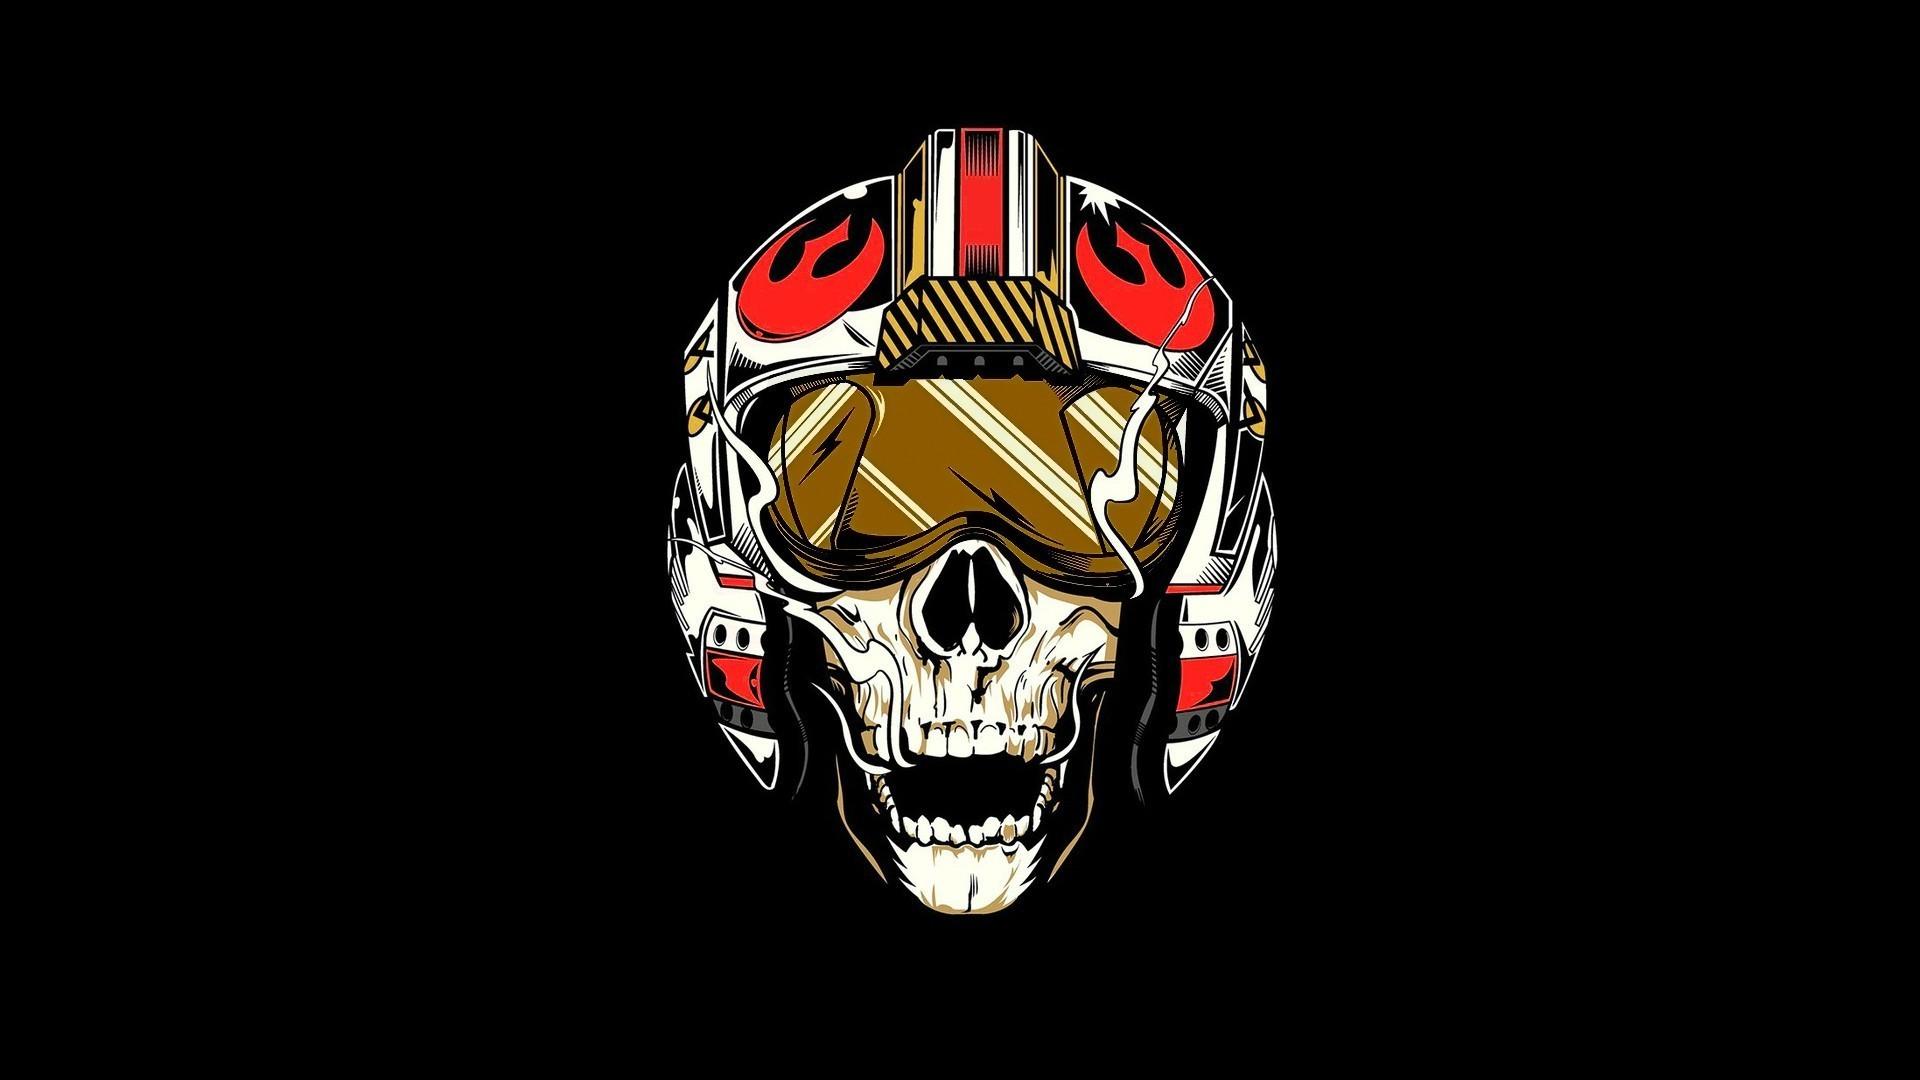 1920x1080 Star Wars, Rebel Alliance, Pilot, Skull Wallpapers HD / Desktop .